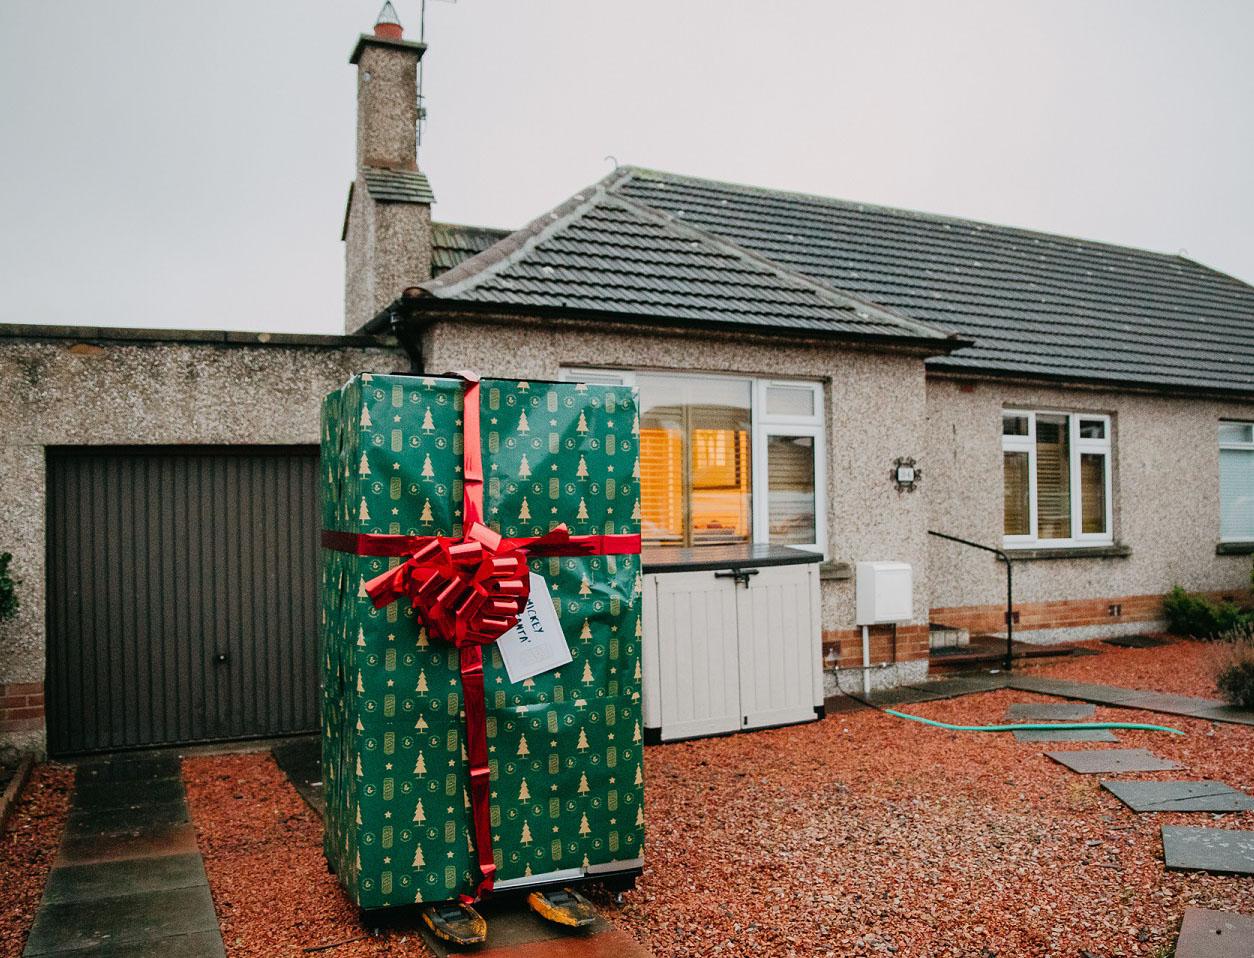 Innis & Gunn Delivers Beer Vending Machine To Lucky Edinburgh Resident photo